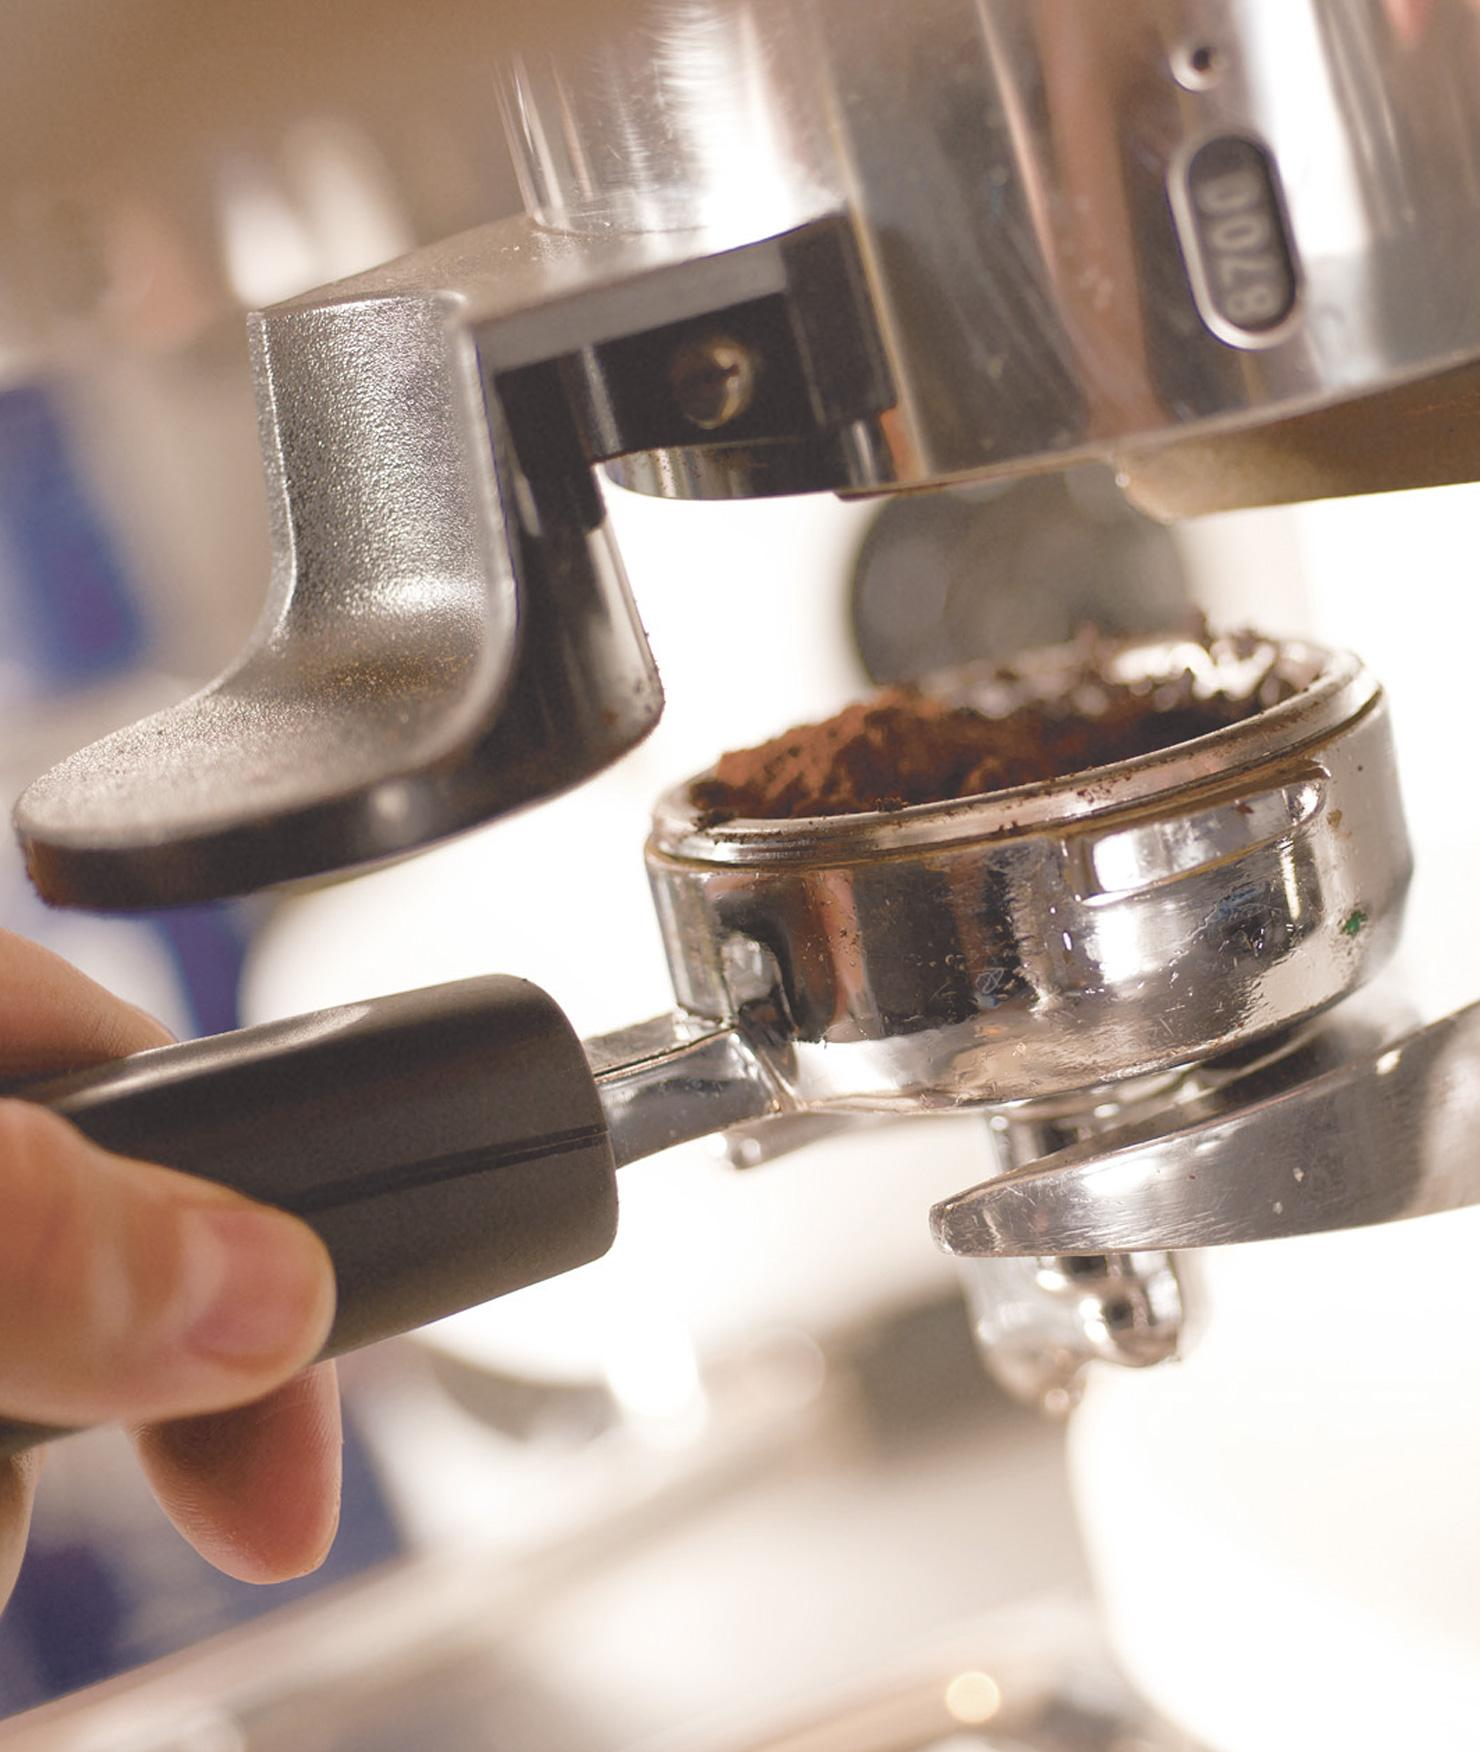 Filtro BRITA PURITY Quell ST haciendo café detalle